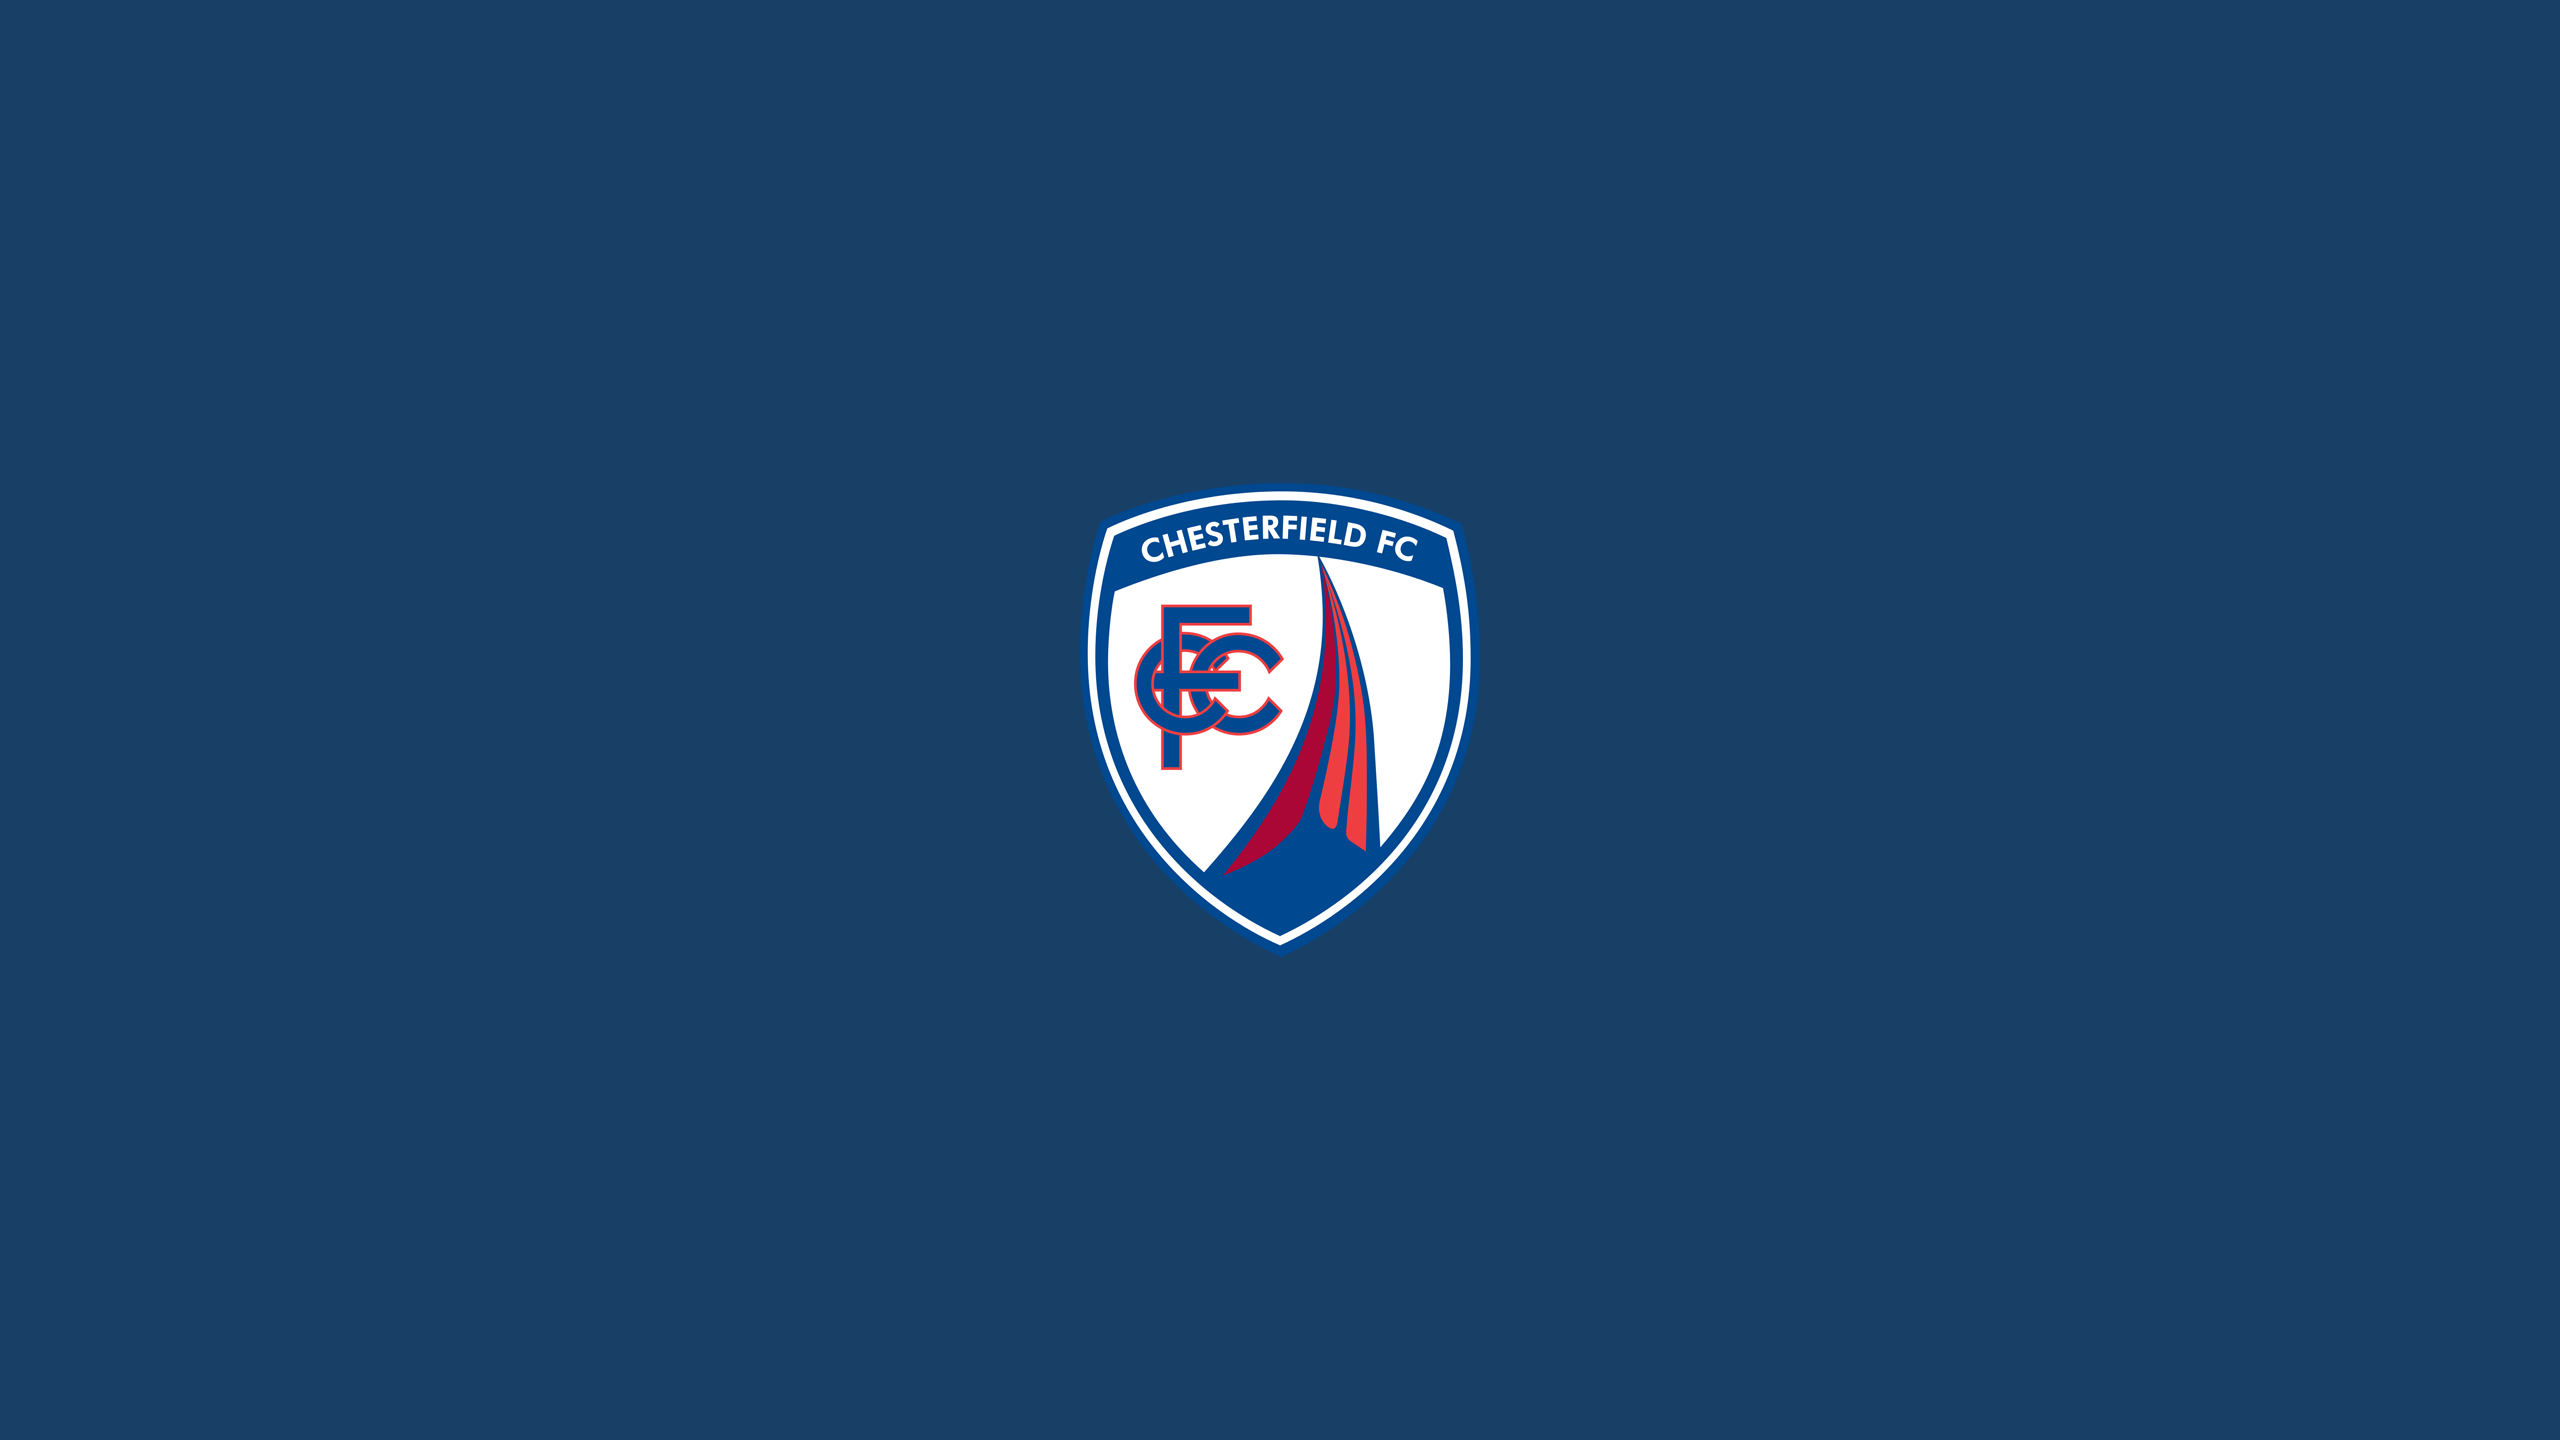 Chesterfield FC (Third)